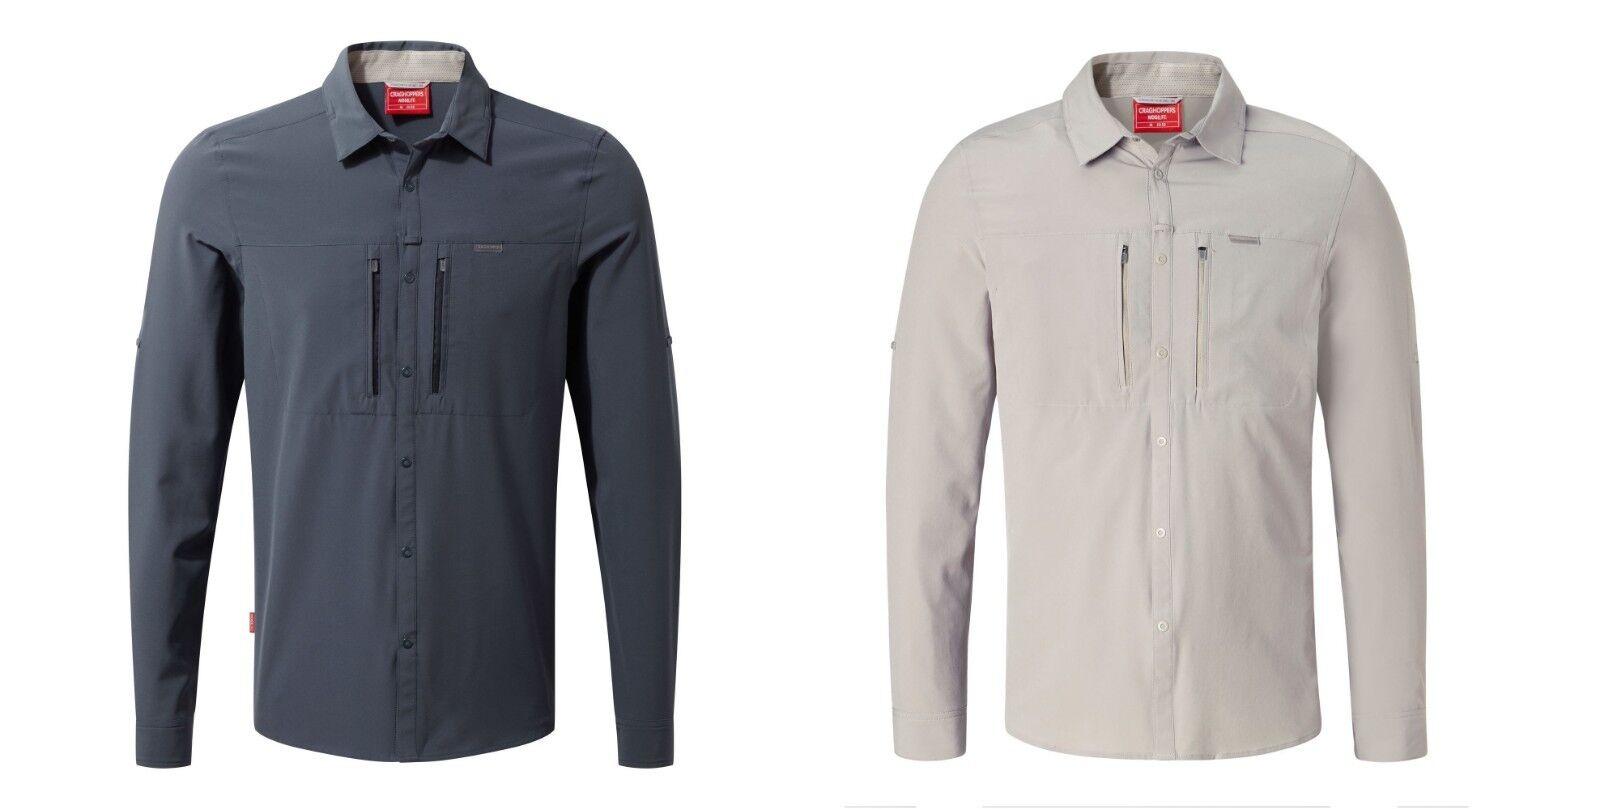 Craghoppers NosiLife Pro Langarm Hemd Herren UV- und Moskitoschutz  99,95 50%